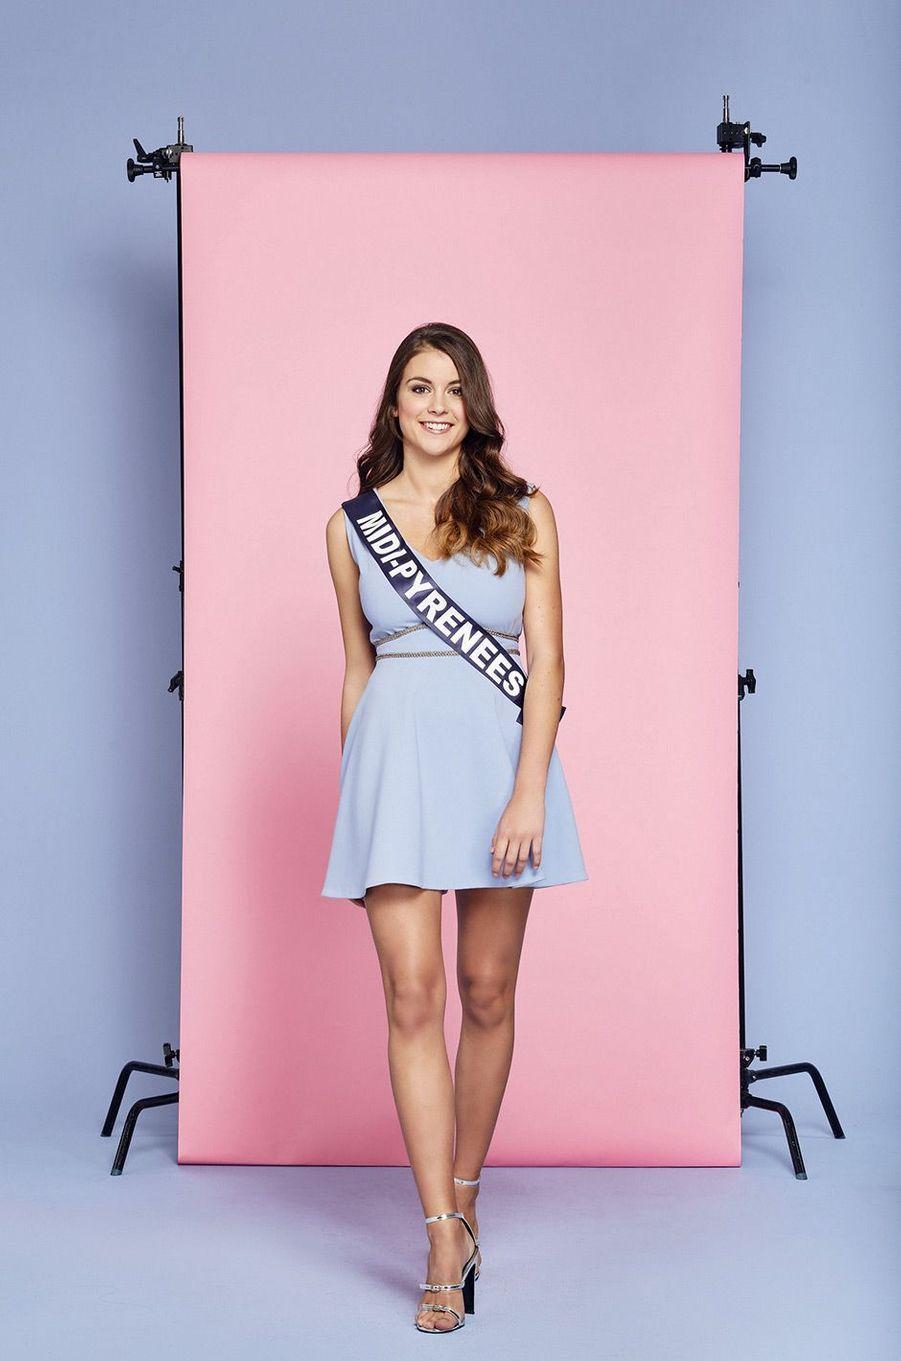 Miss Midi-Pyrénées: Axelle Brielle